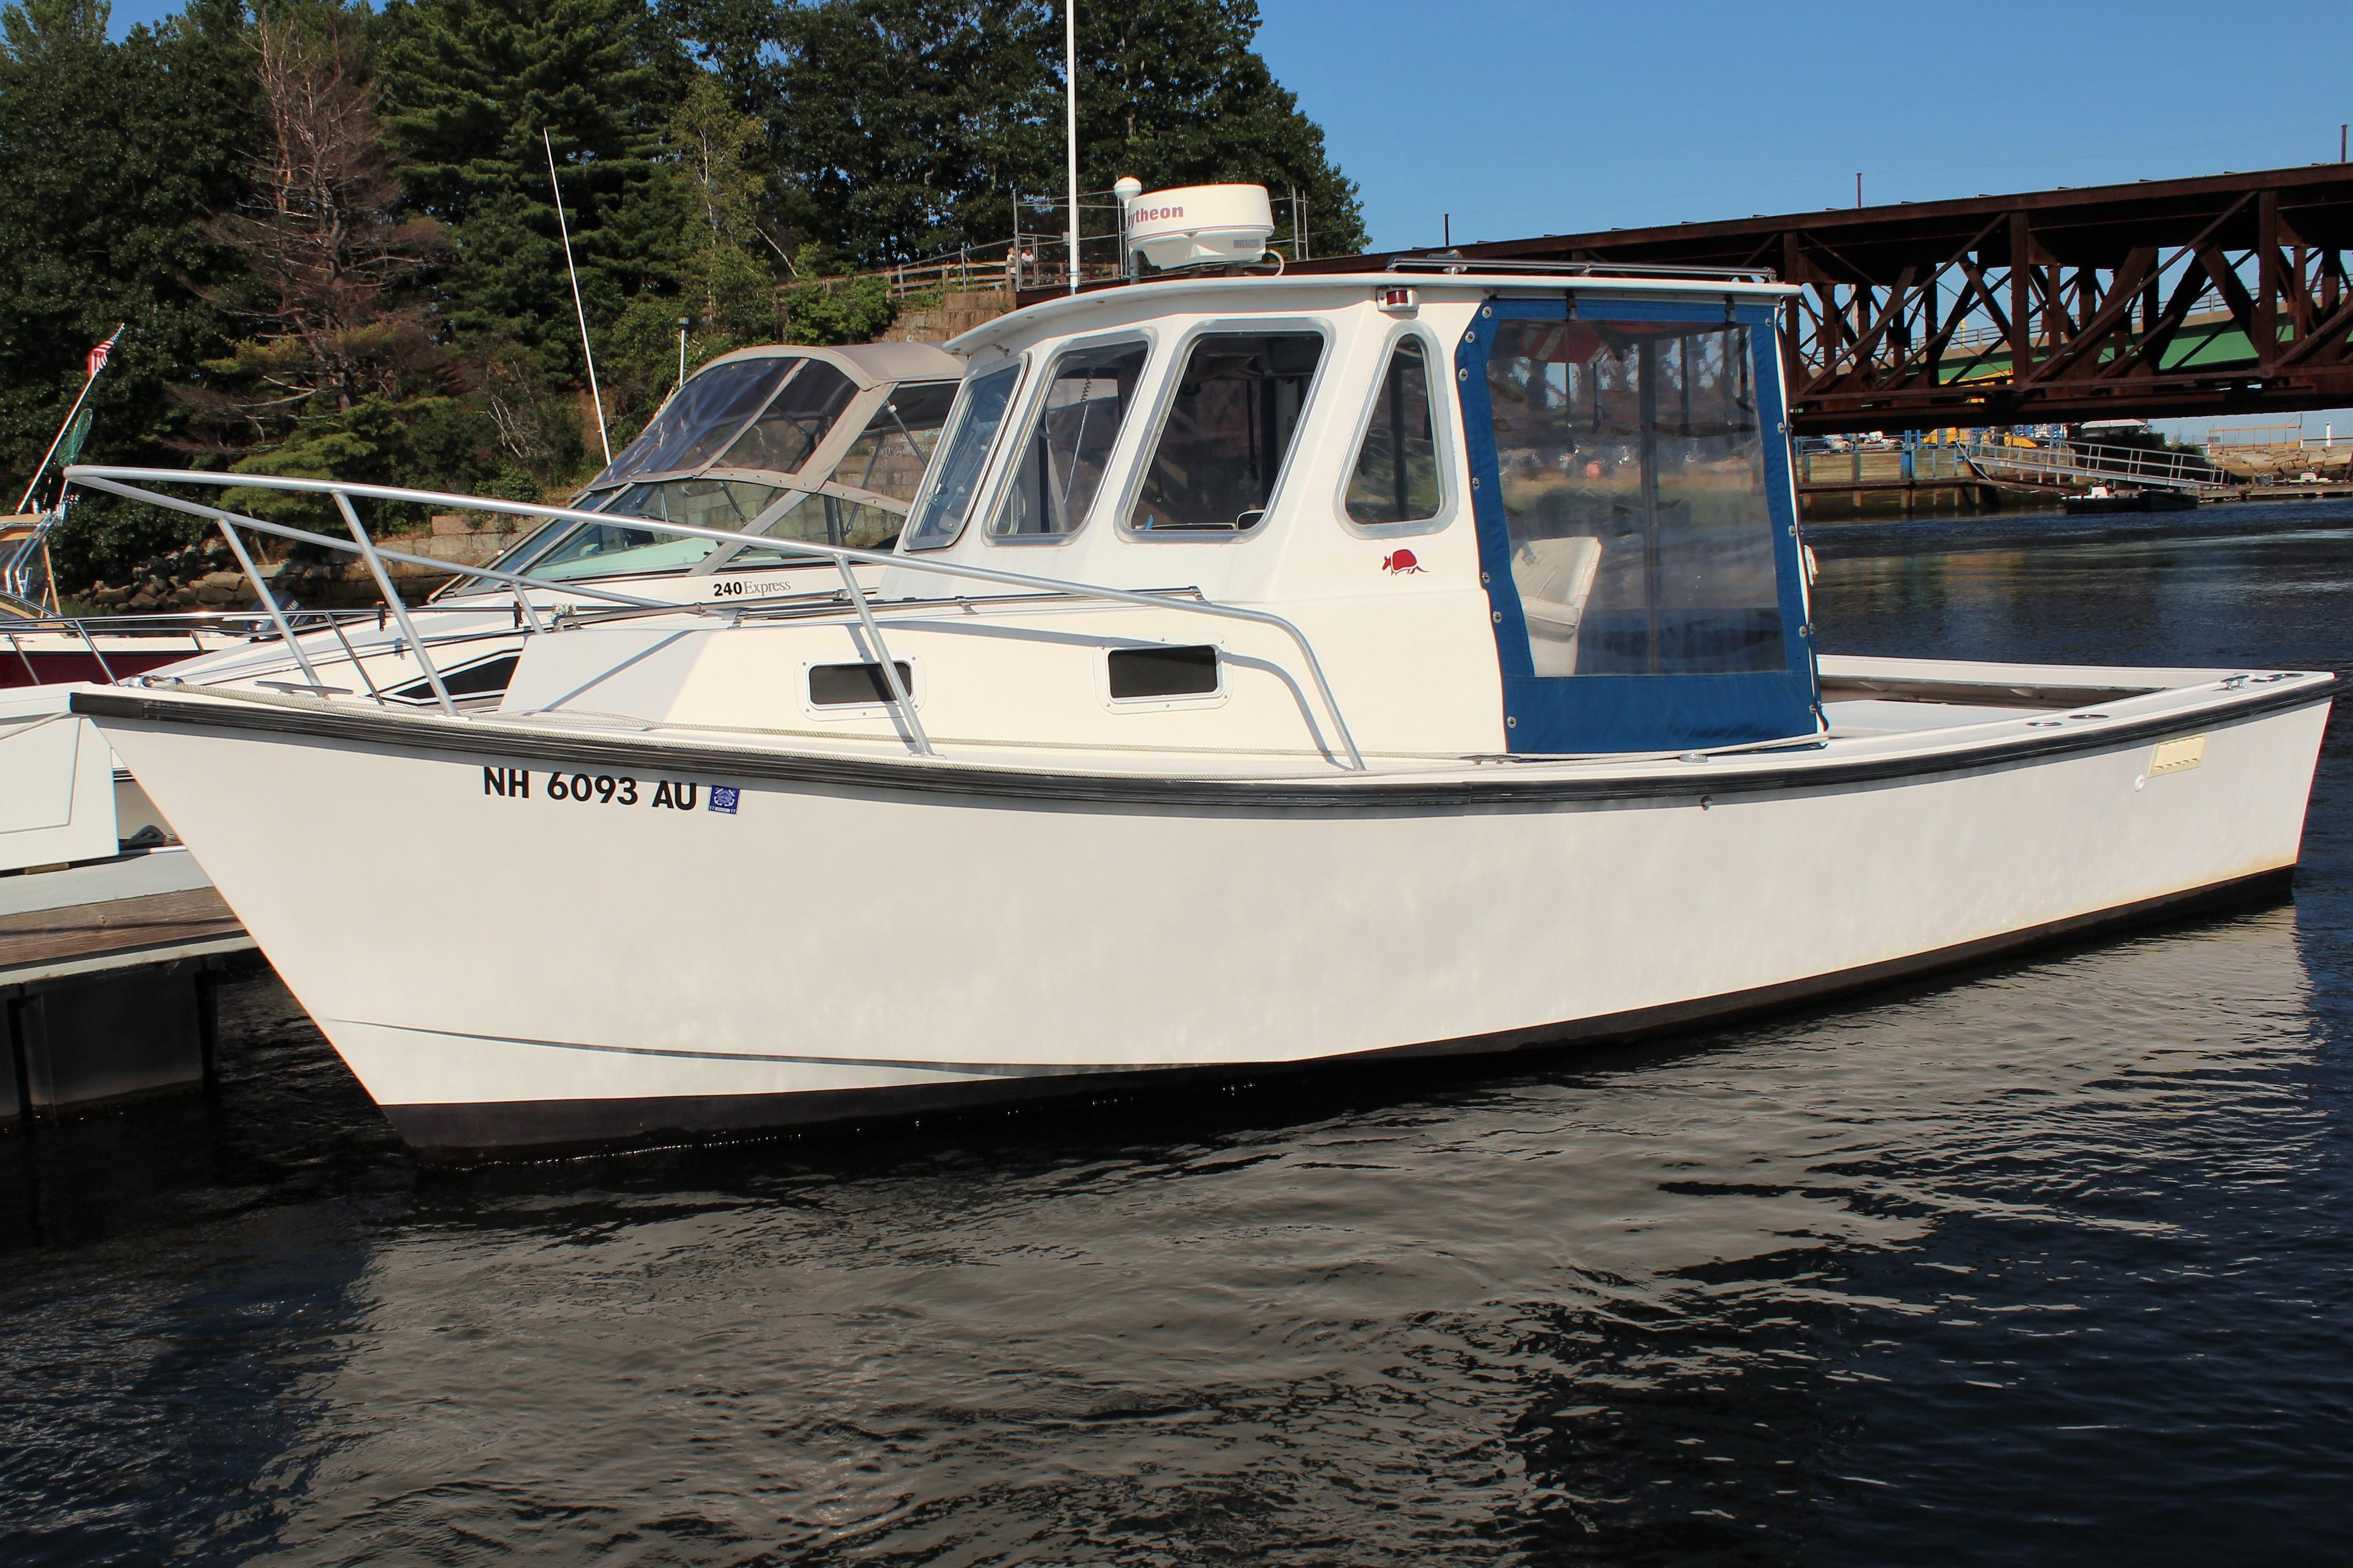 1995 Seaworthy 25 Power Boat For Sale - www.yachtworld.com